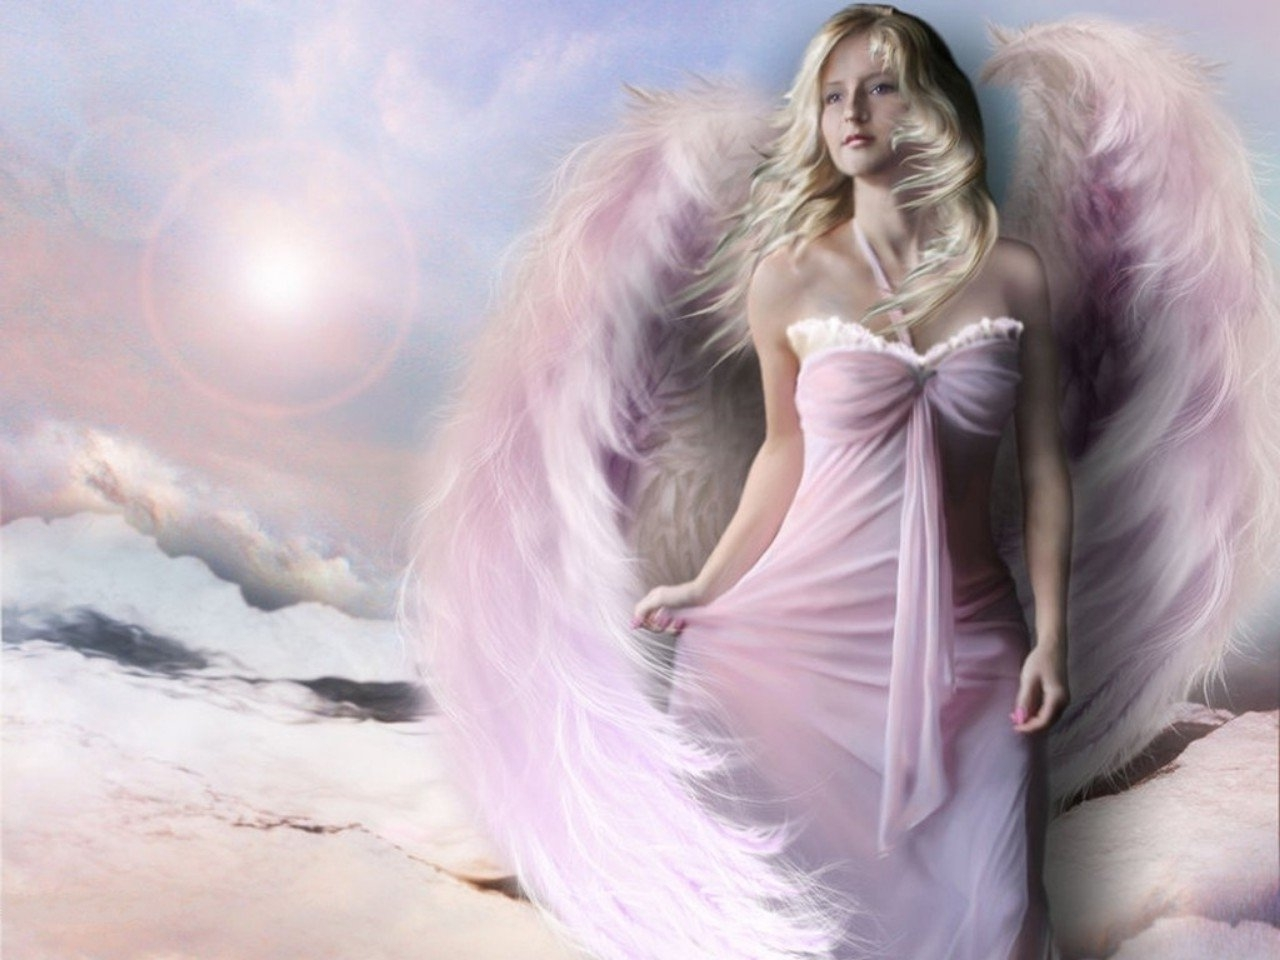 angel wallpaper download description angel wallpaper 1280x960